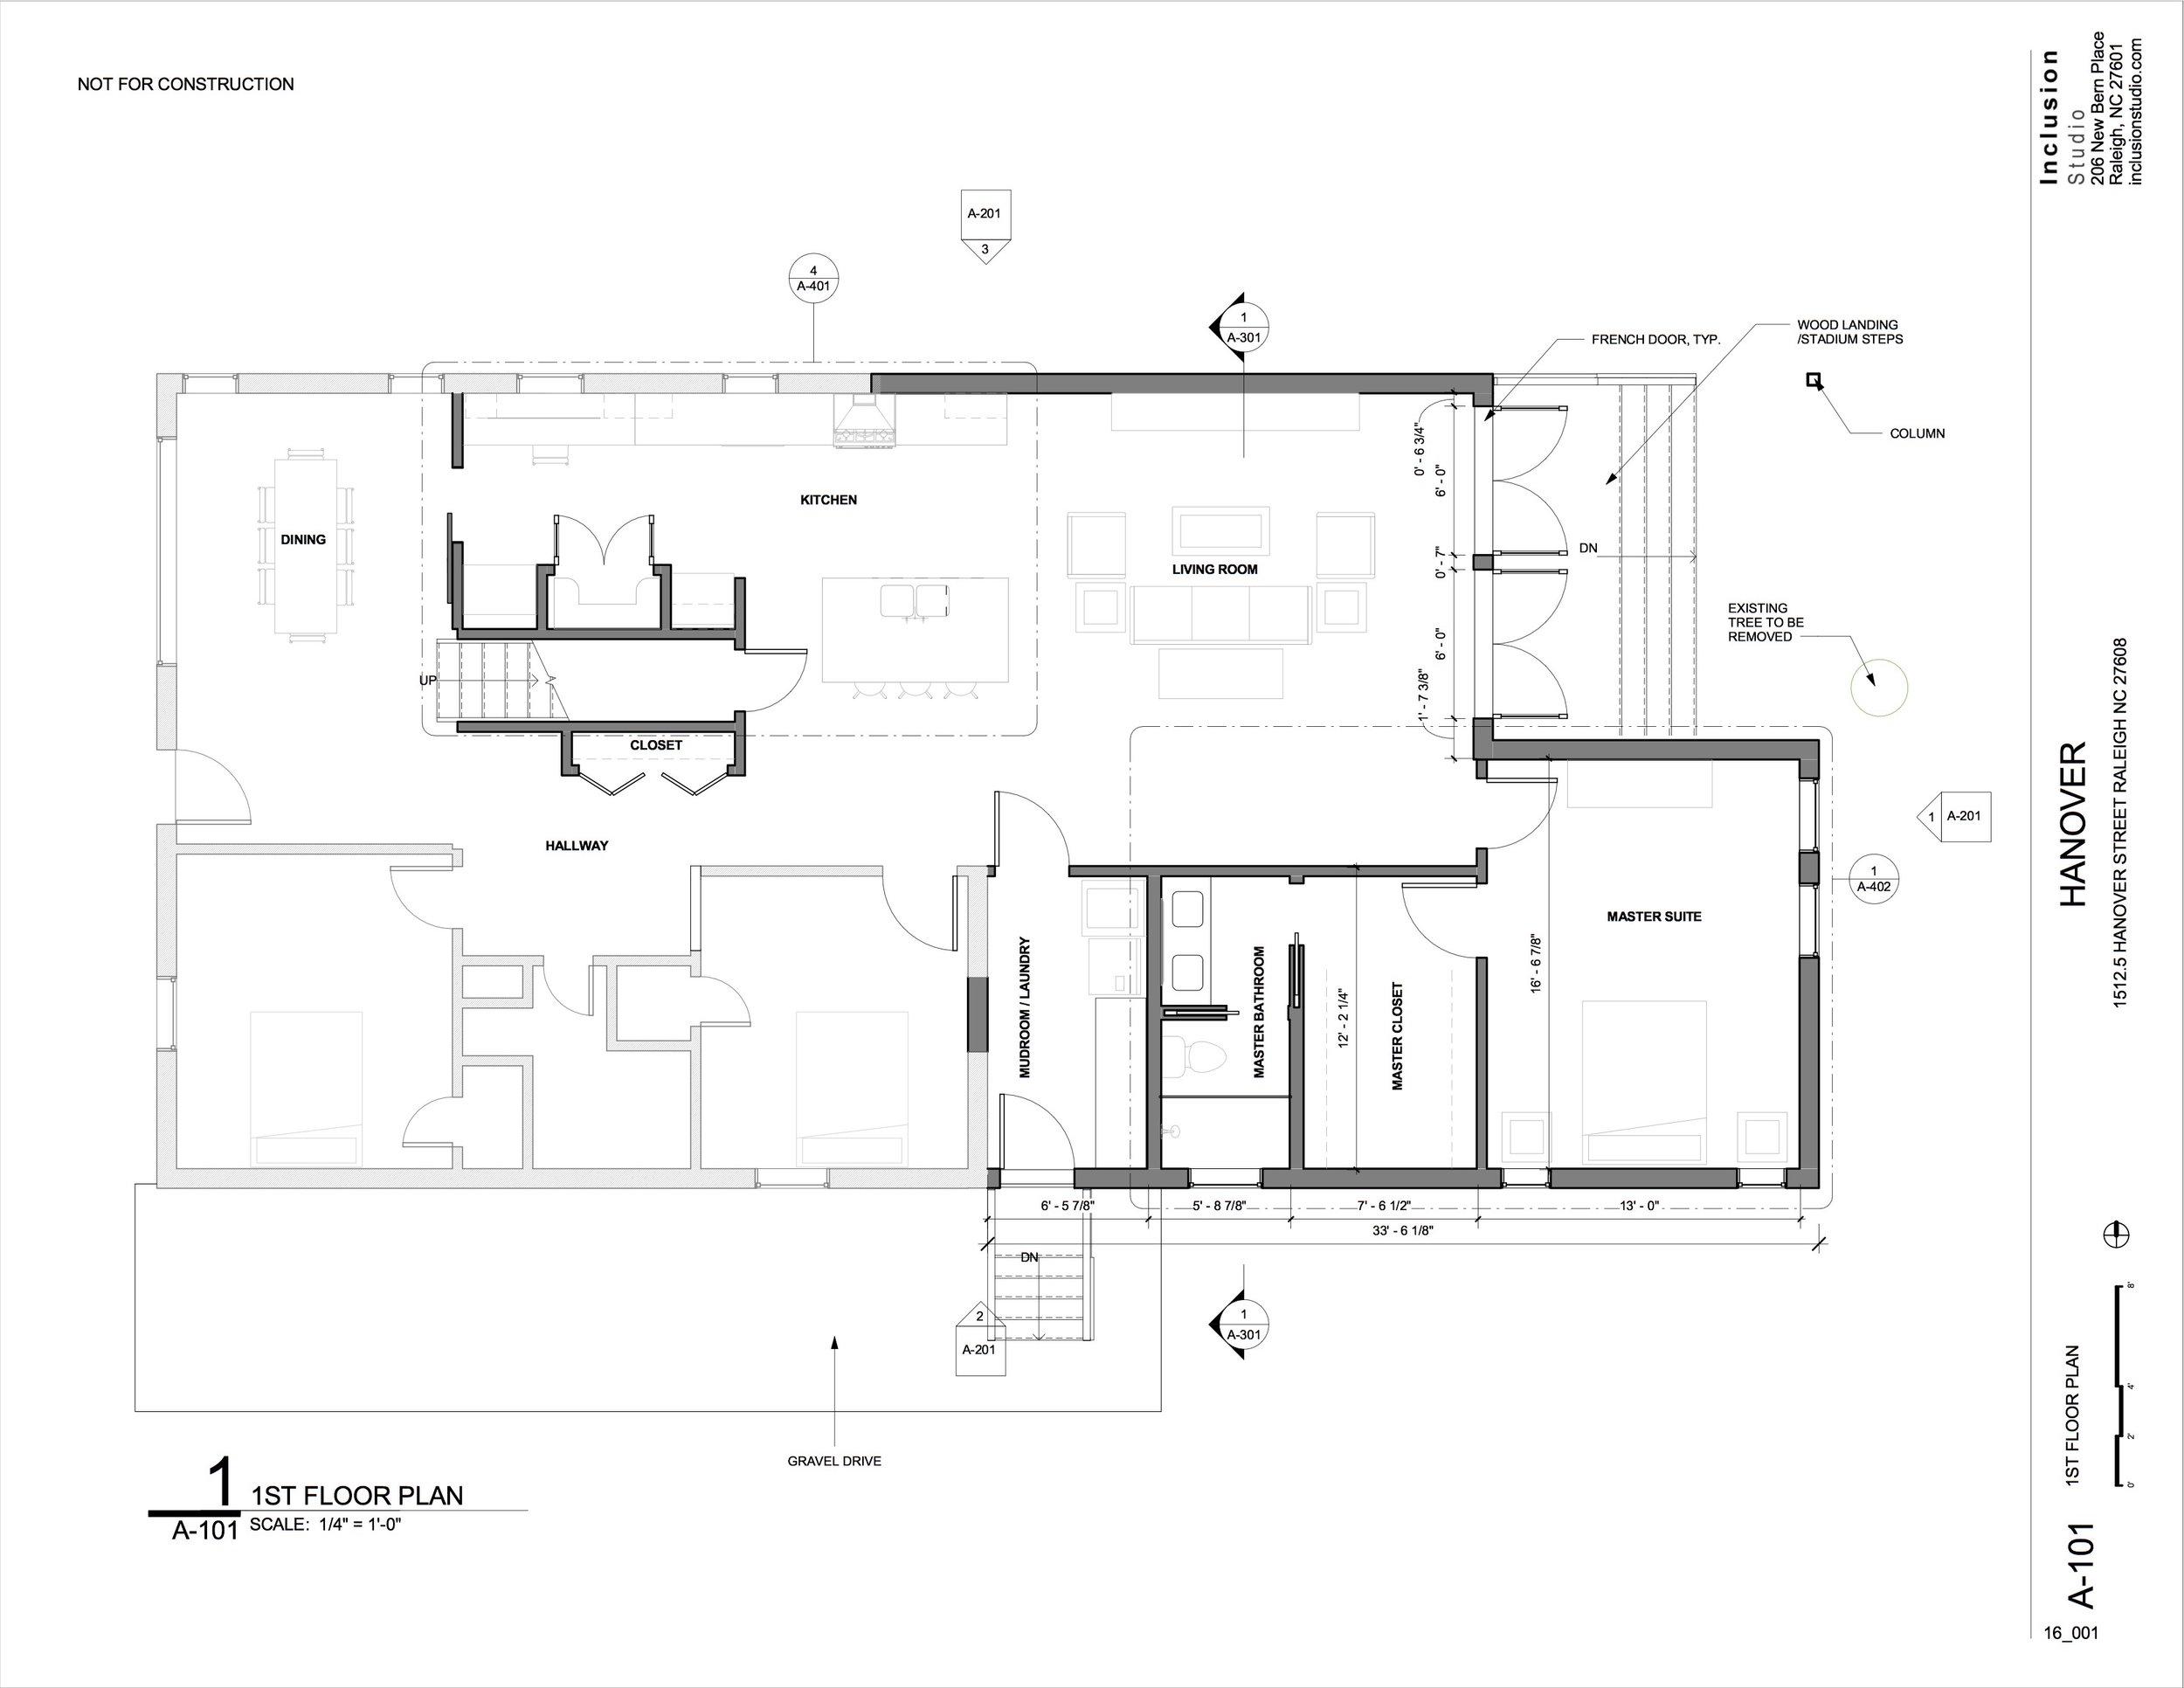 original floor plan.jpg